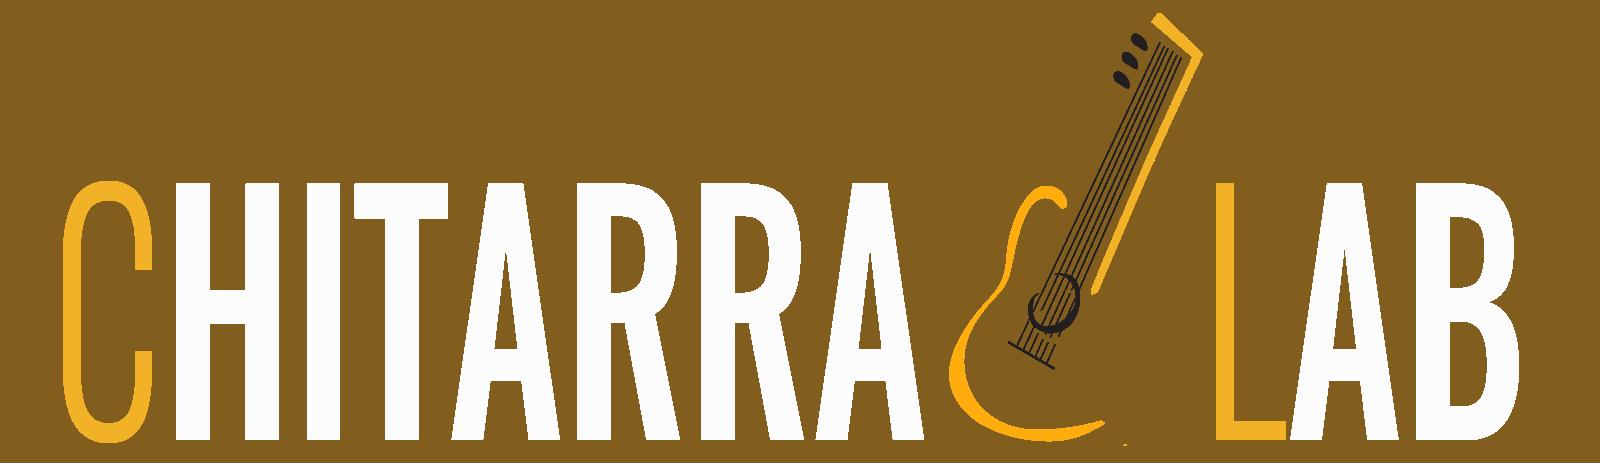 Chitarra Lab